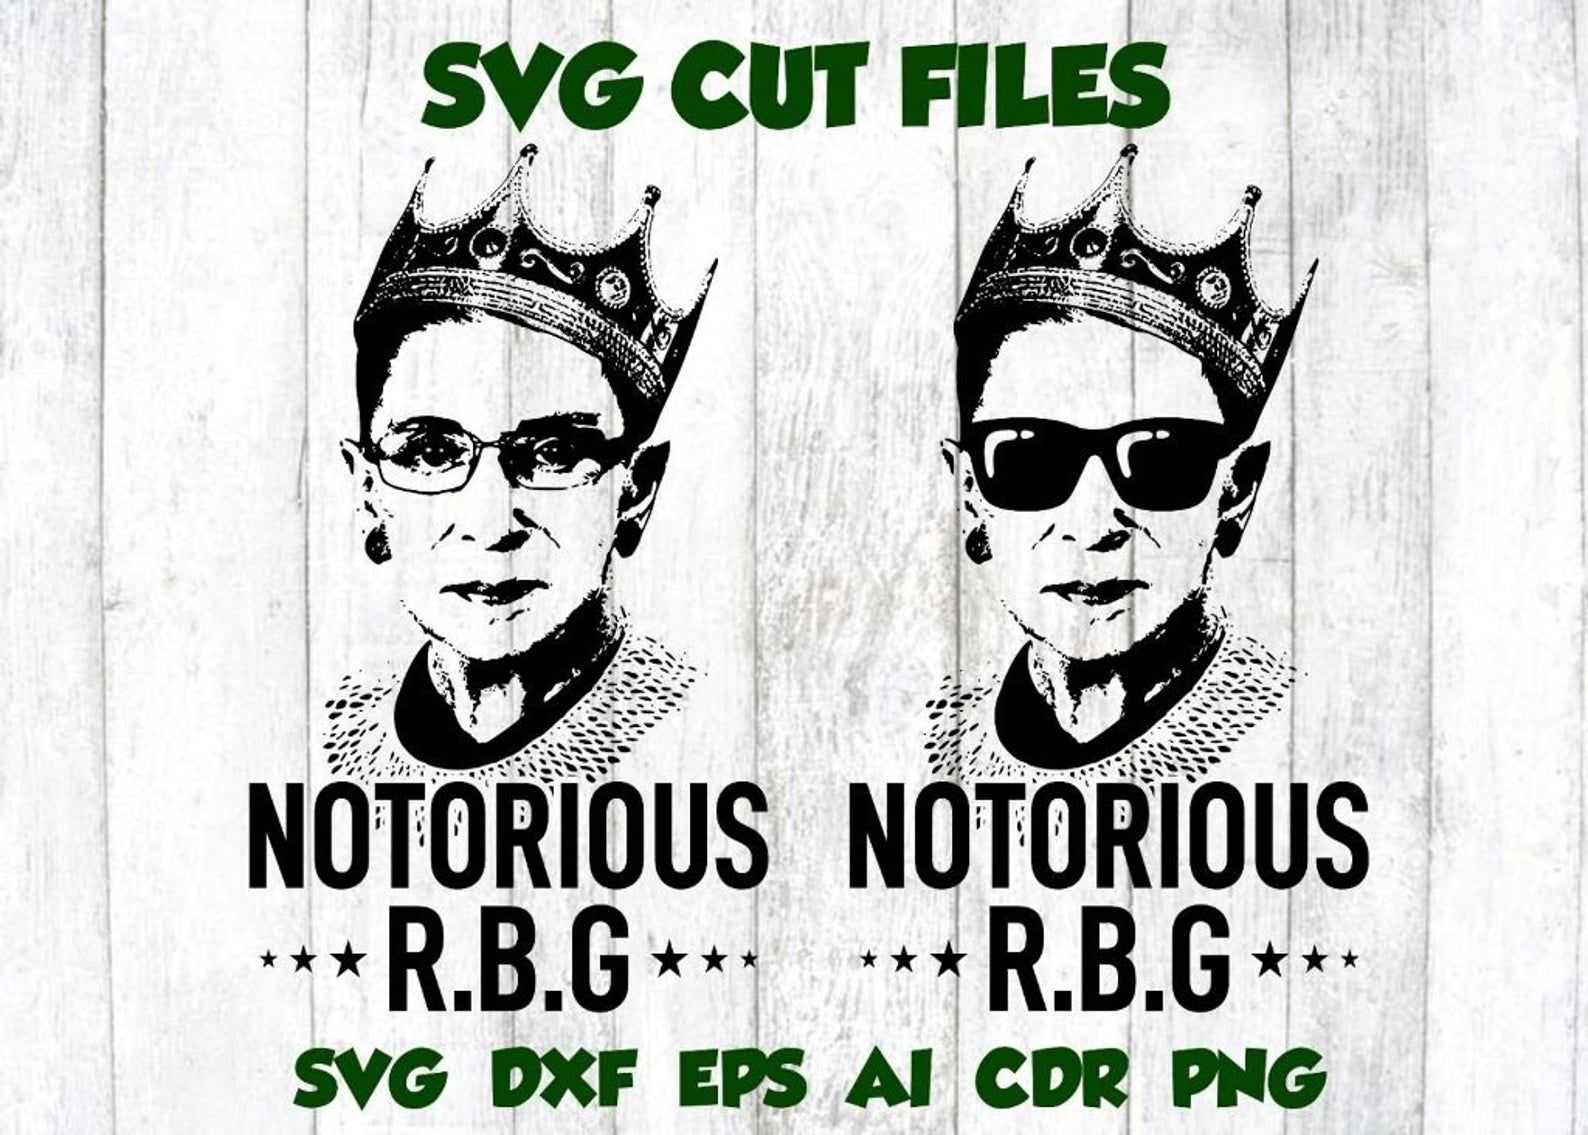 Notorious RBG Girl Power Ruth Bader Ginsburg Feminism SVG